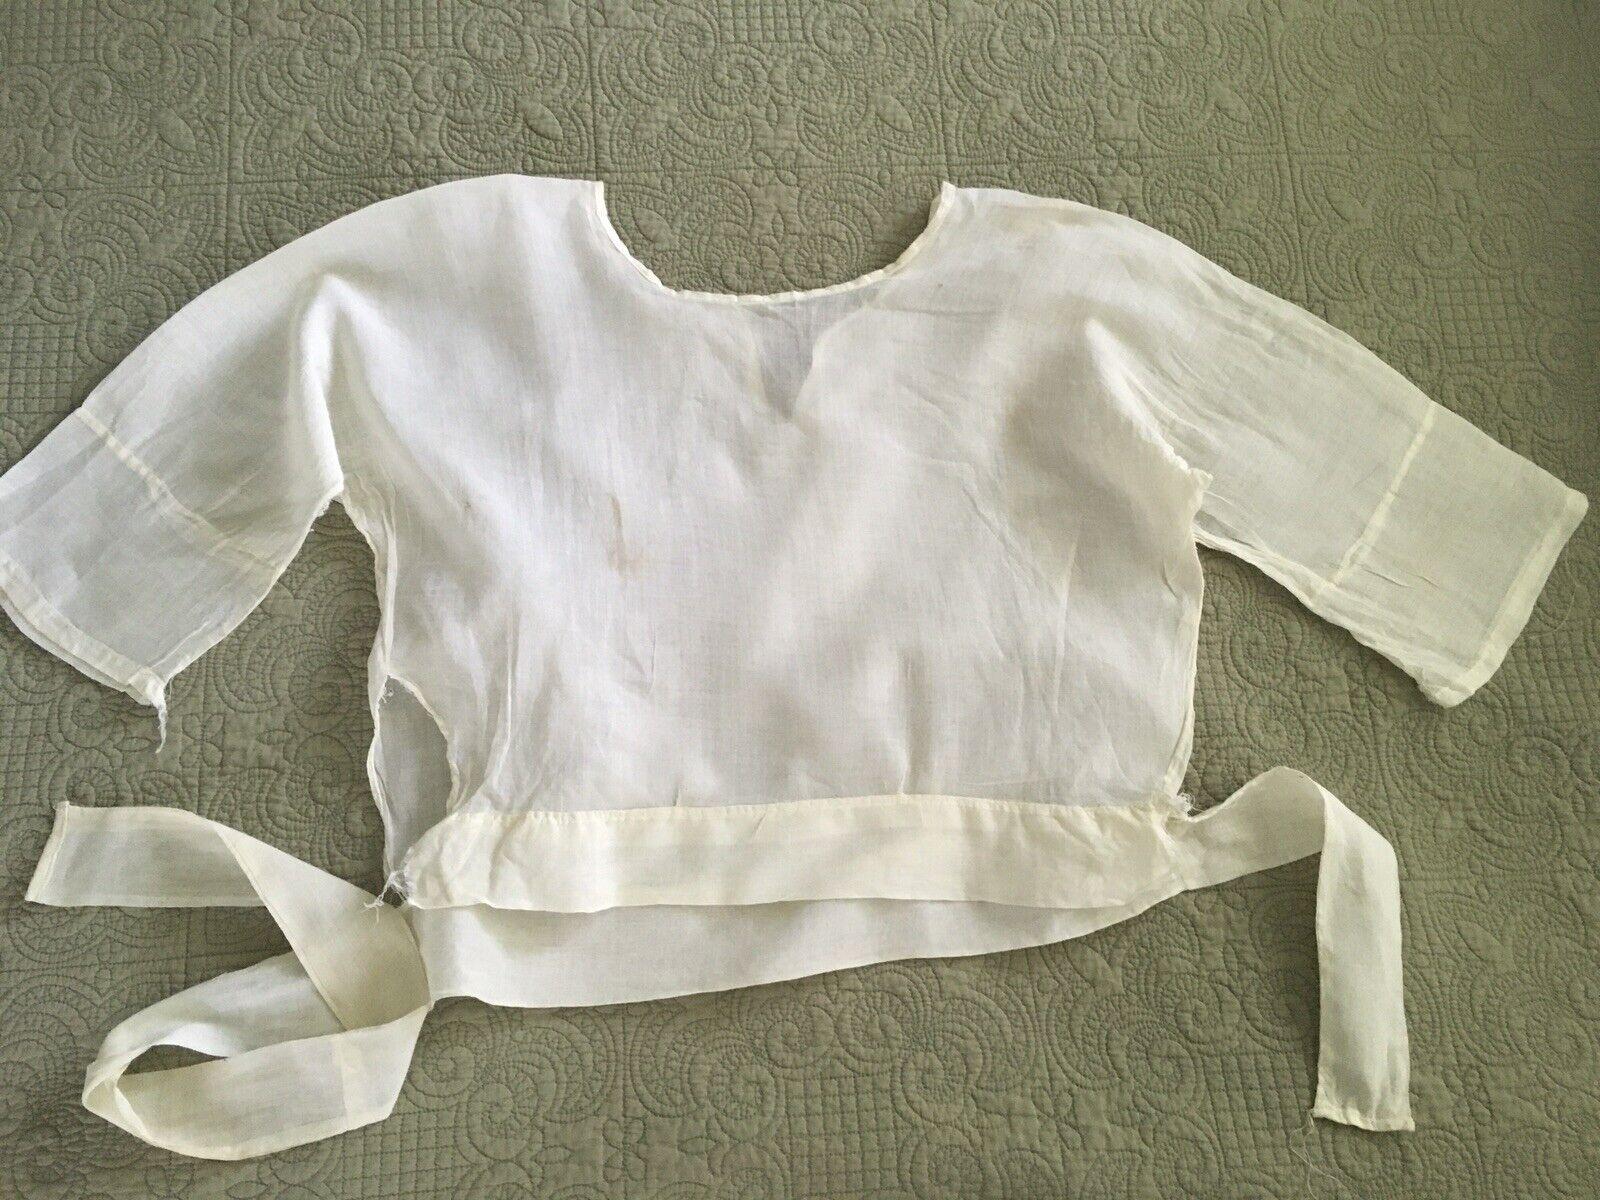 Antique Edwardian Victorian Shirtwaist Blouse - image 7